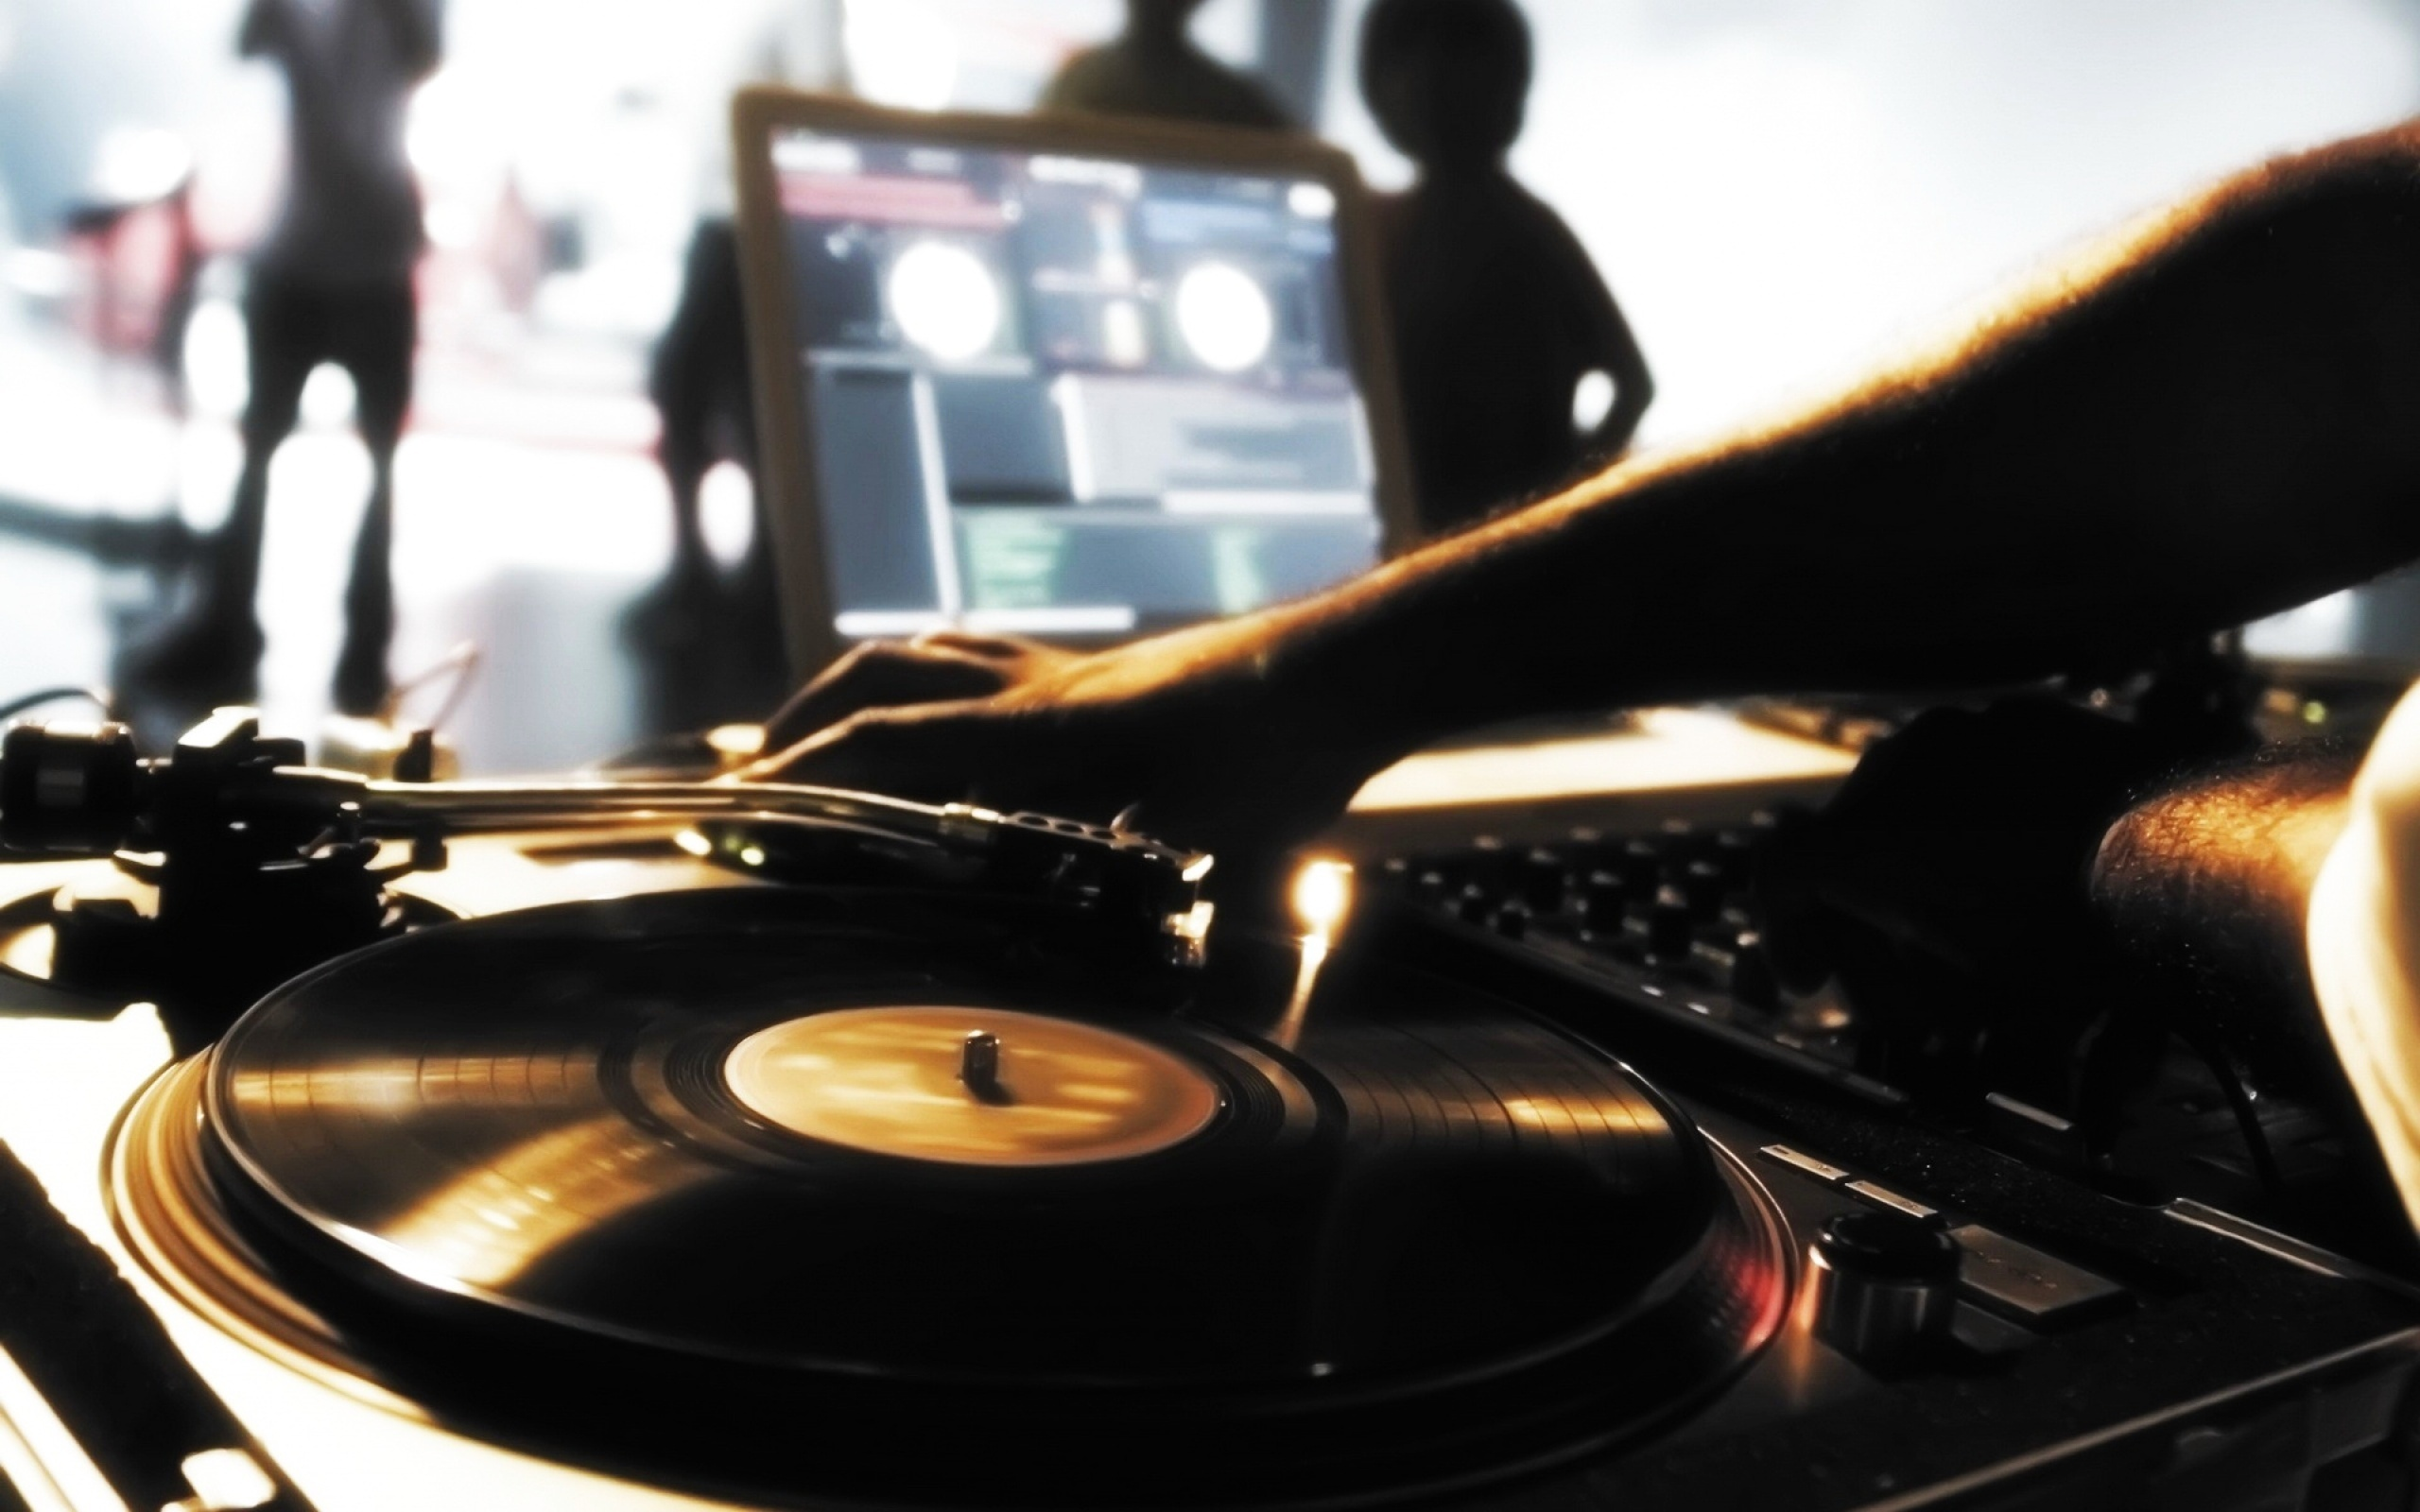 House music dj wallpaper wallpapersafari for House music records